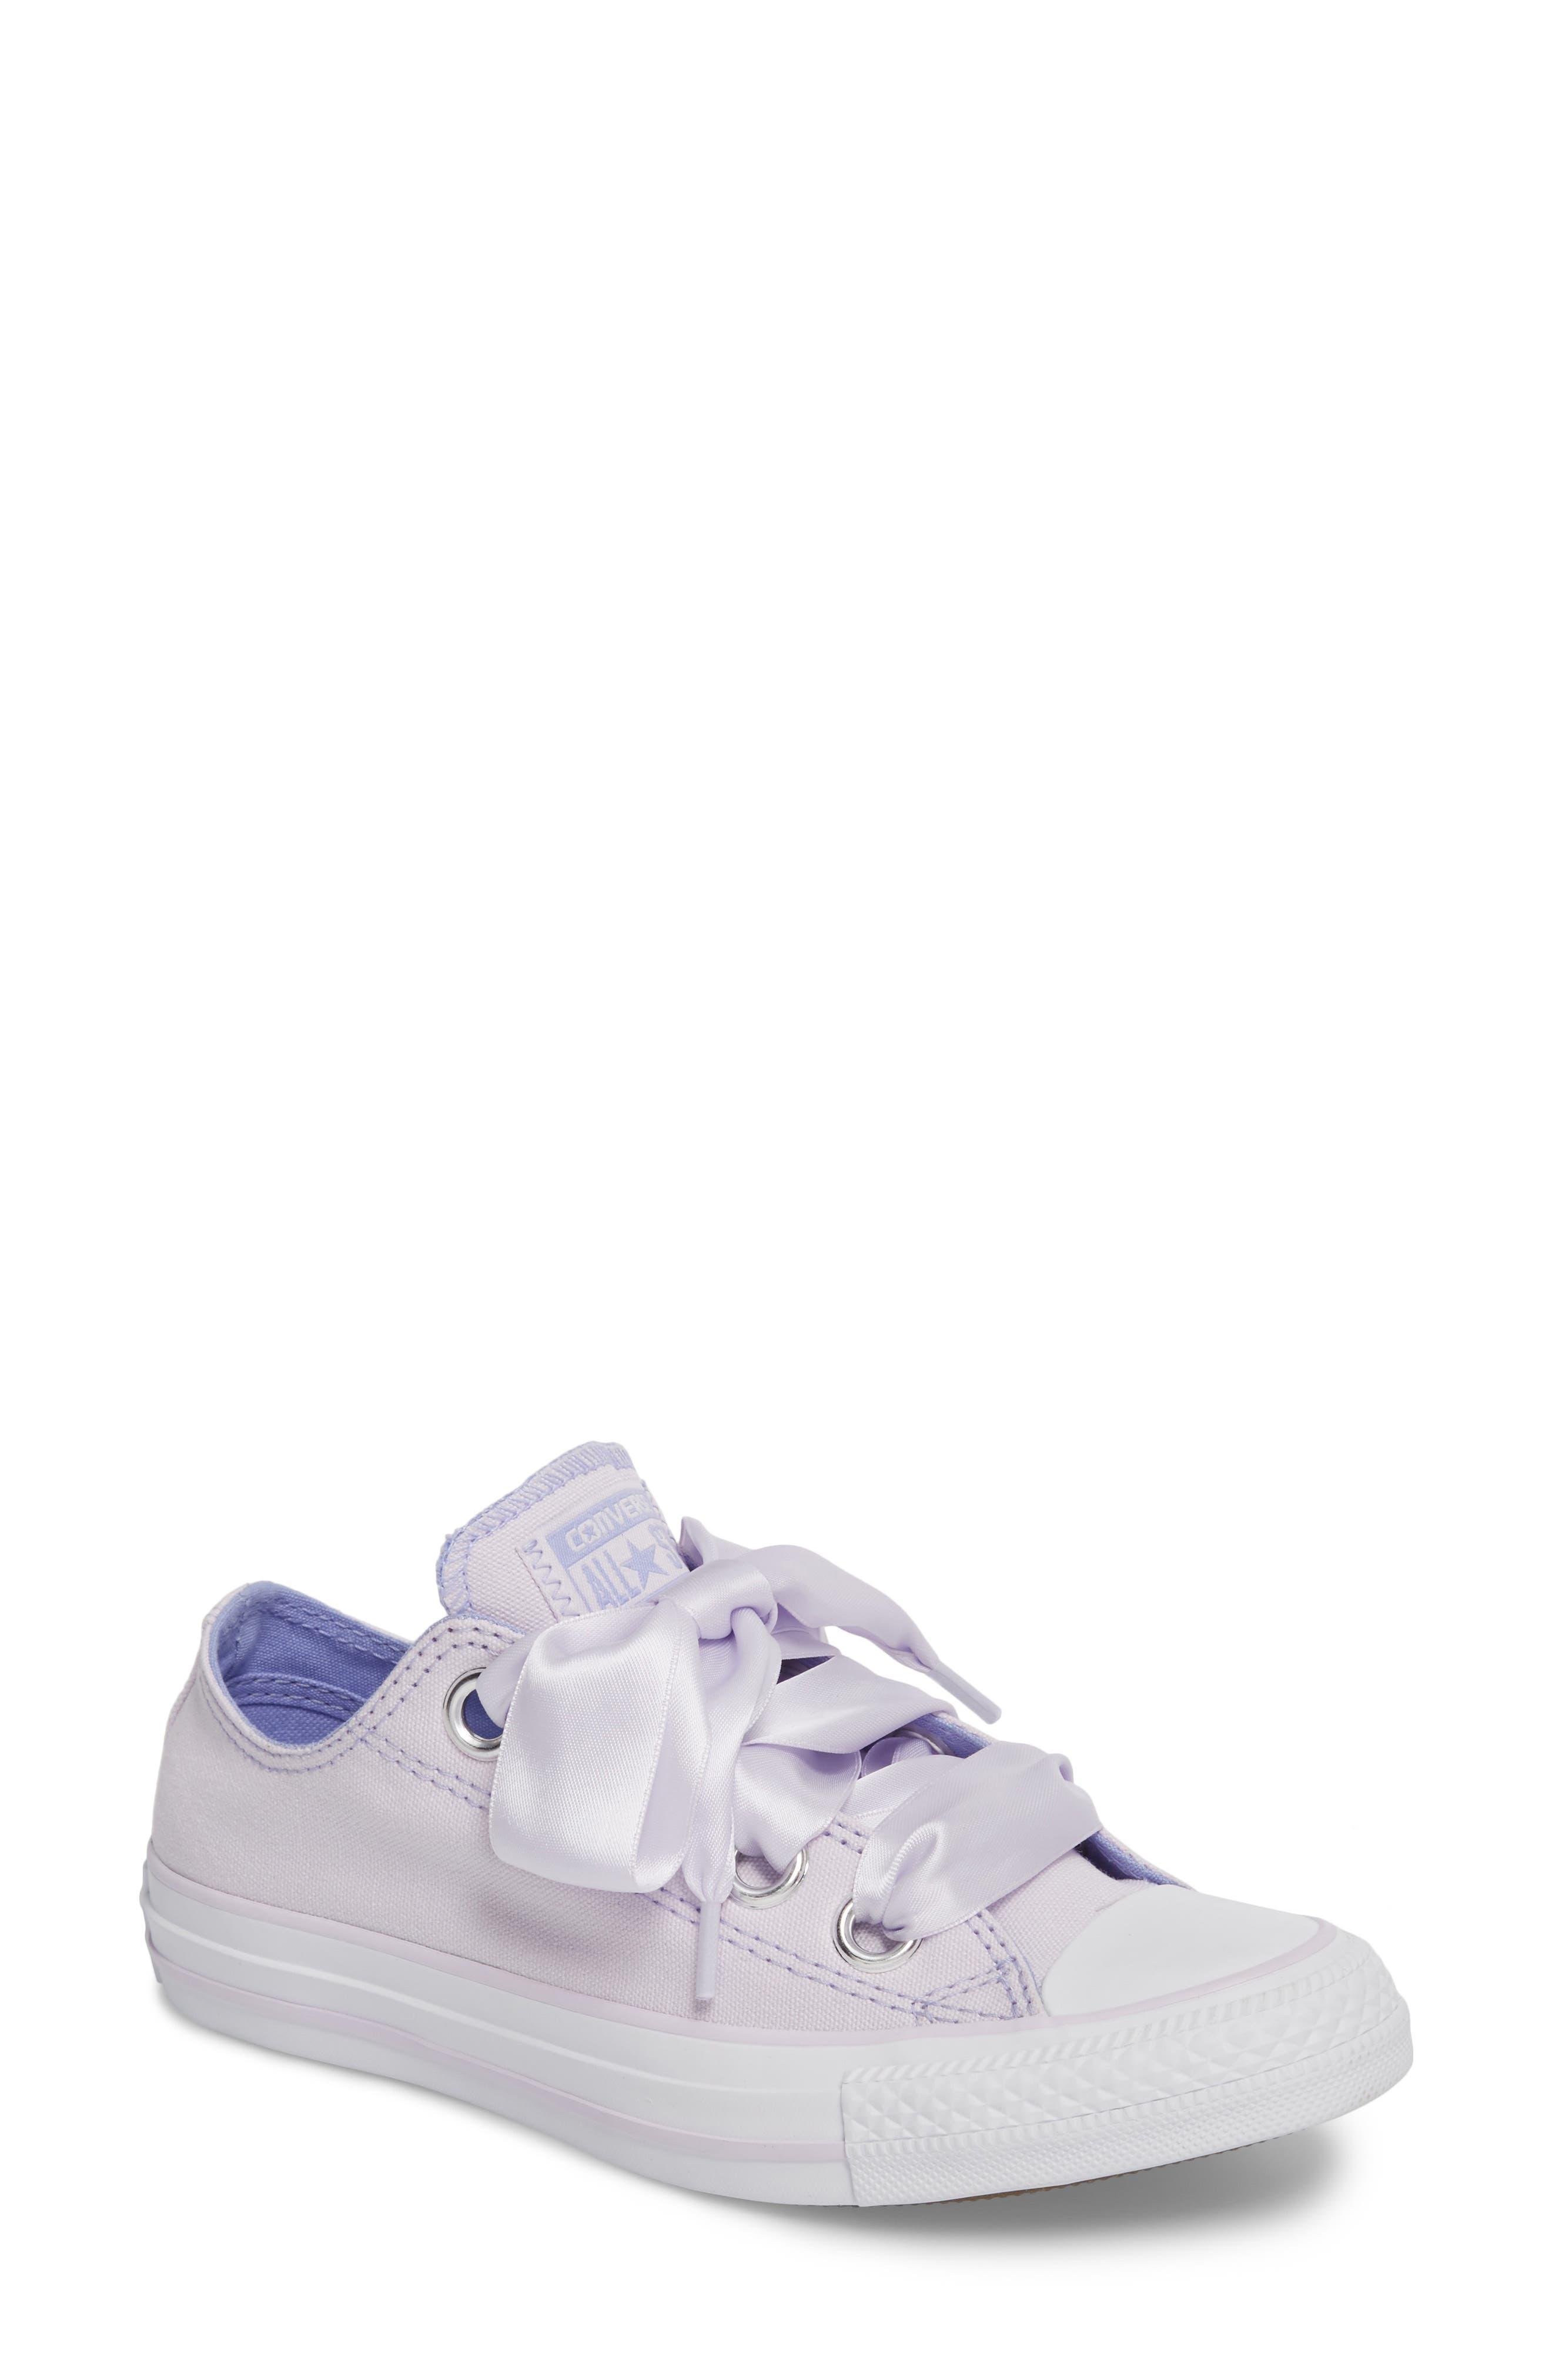 Converse Chuck Taylor® All Star® Big Eyelet Ox Sneaker (Women)